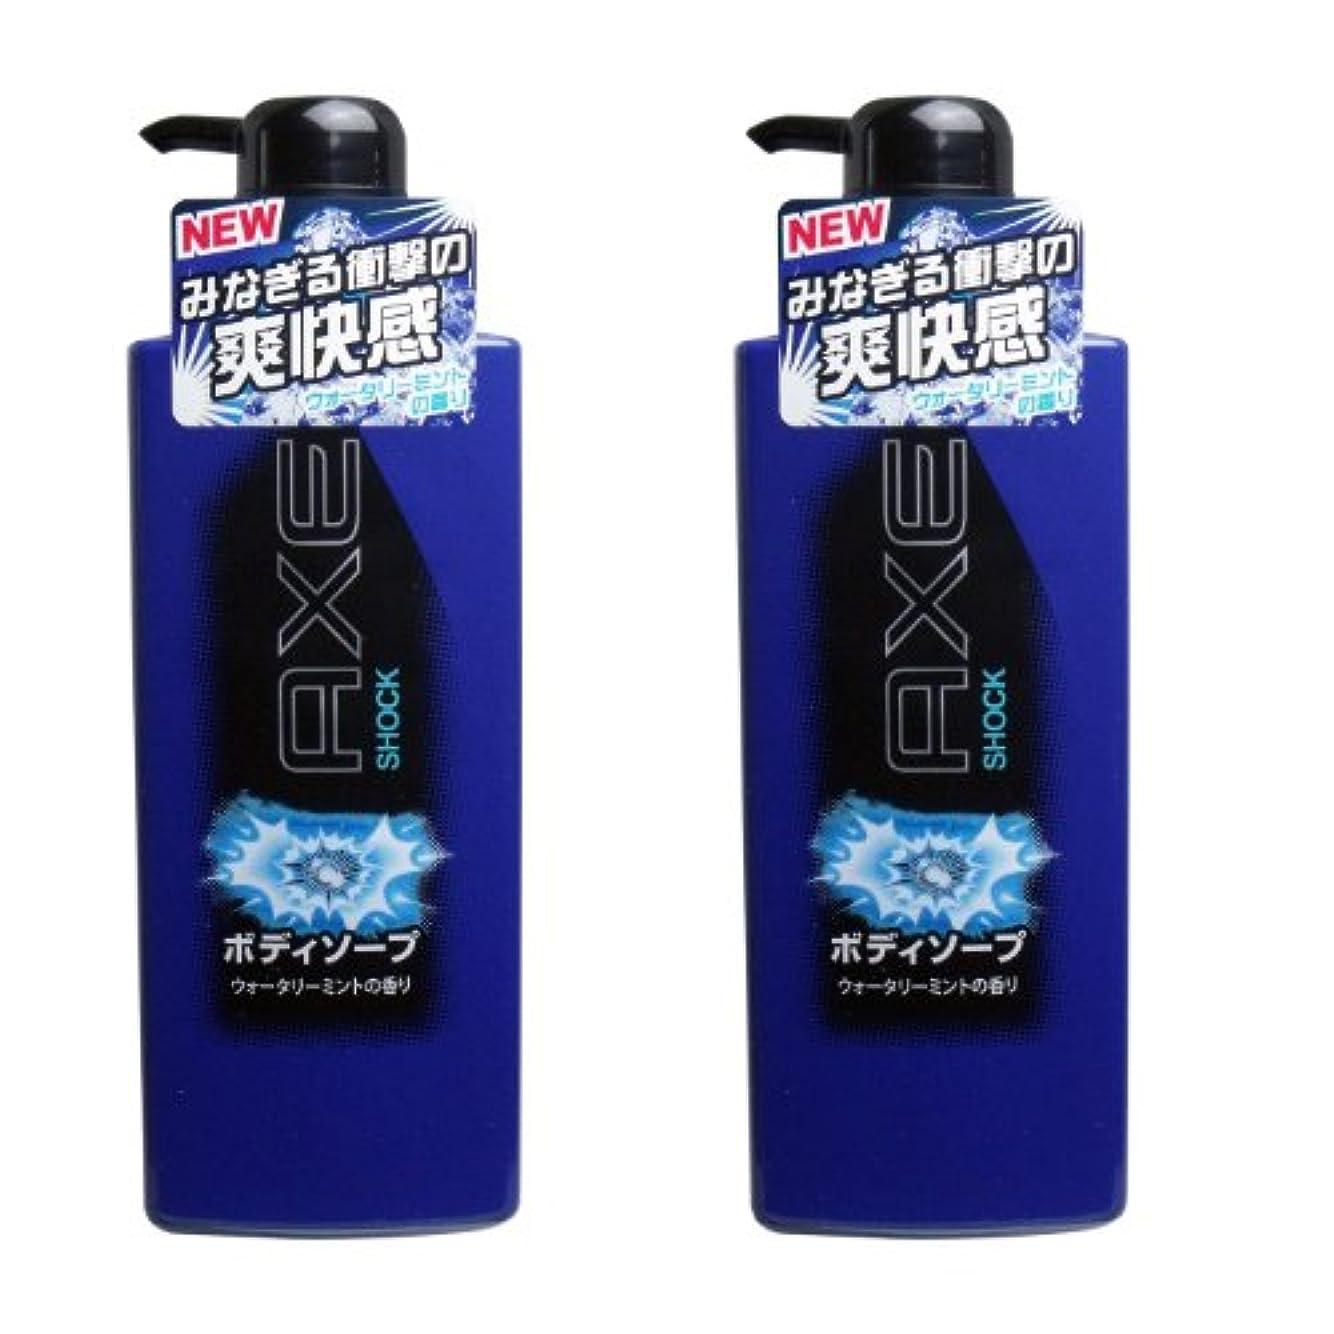 AXE(アックス) ボディソープの2点セット (ショック ウォータリーミントの香り)